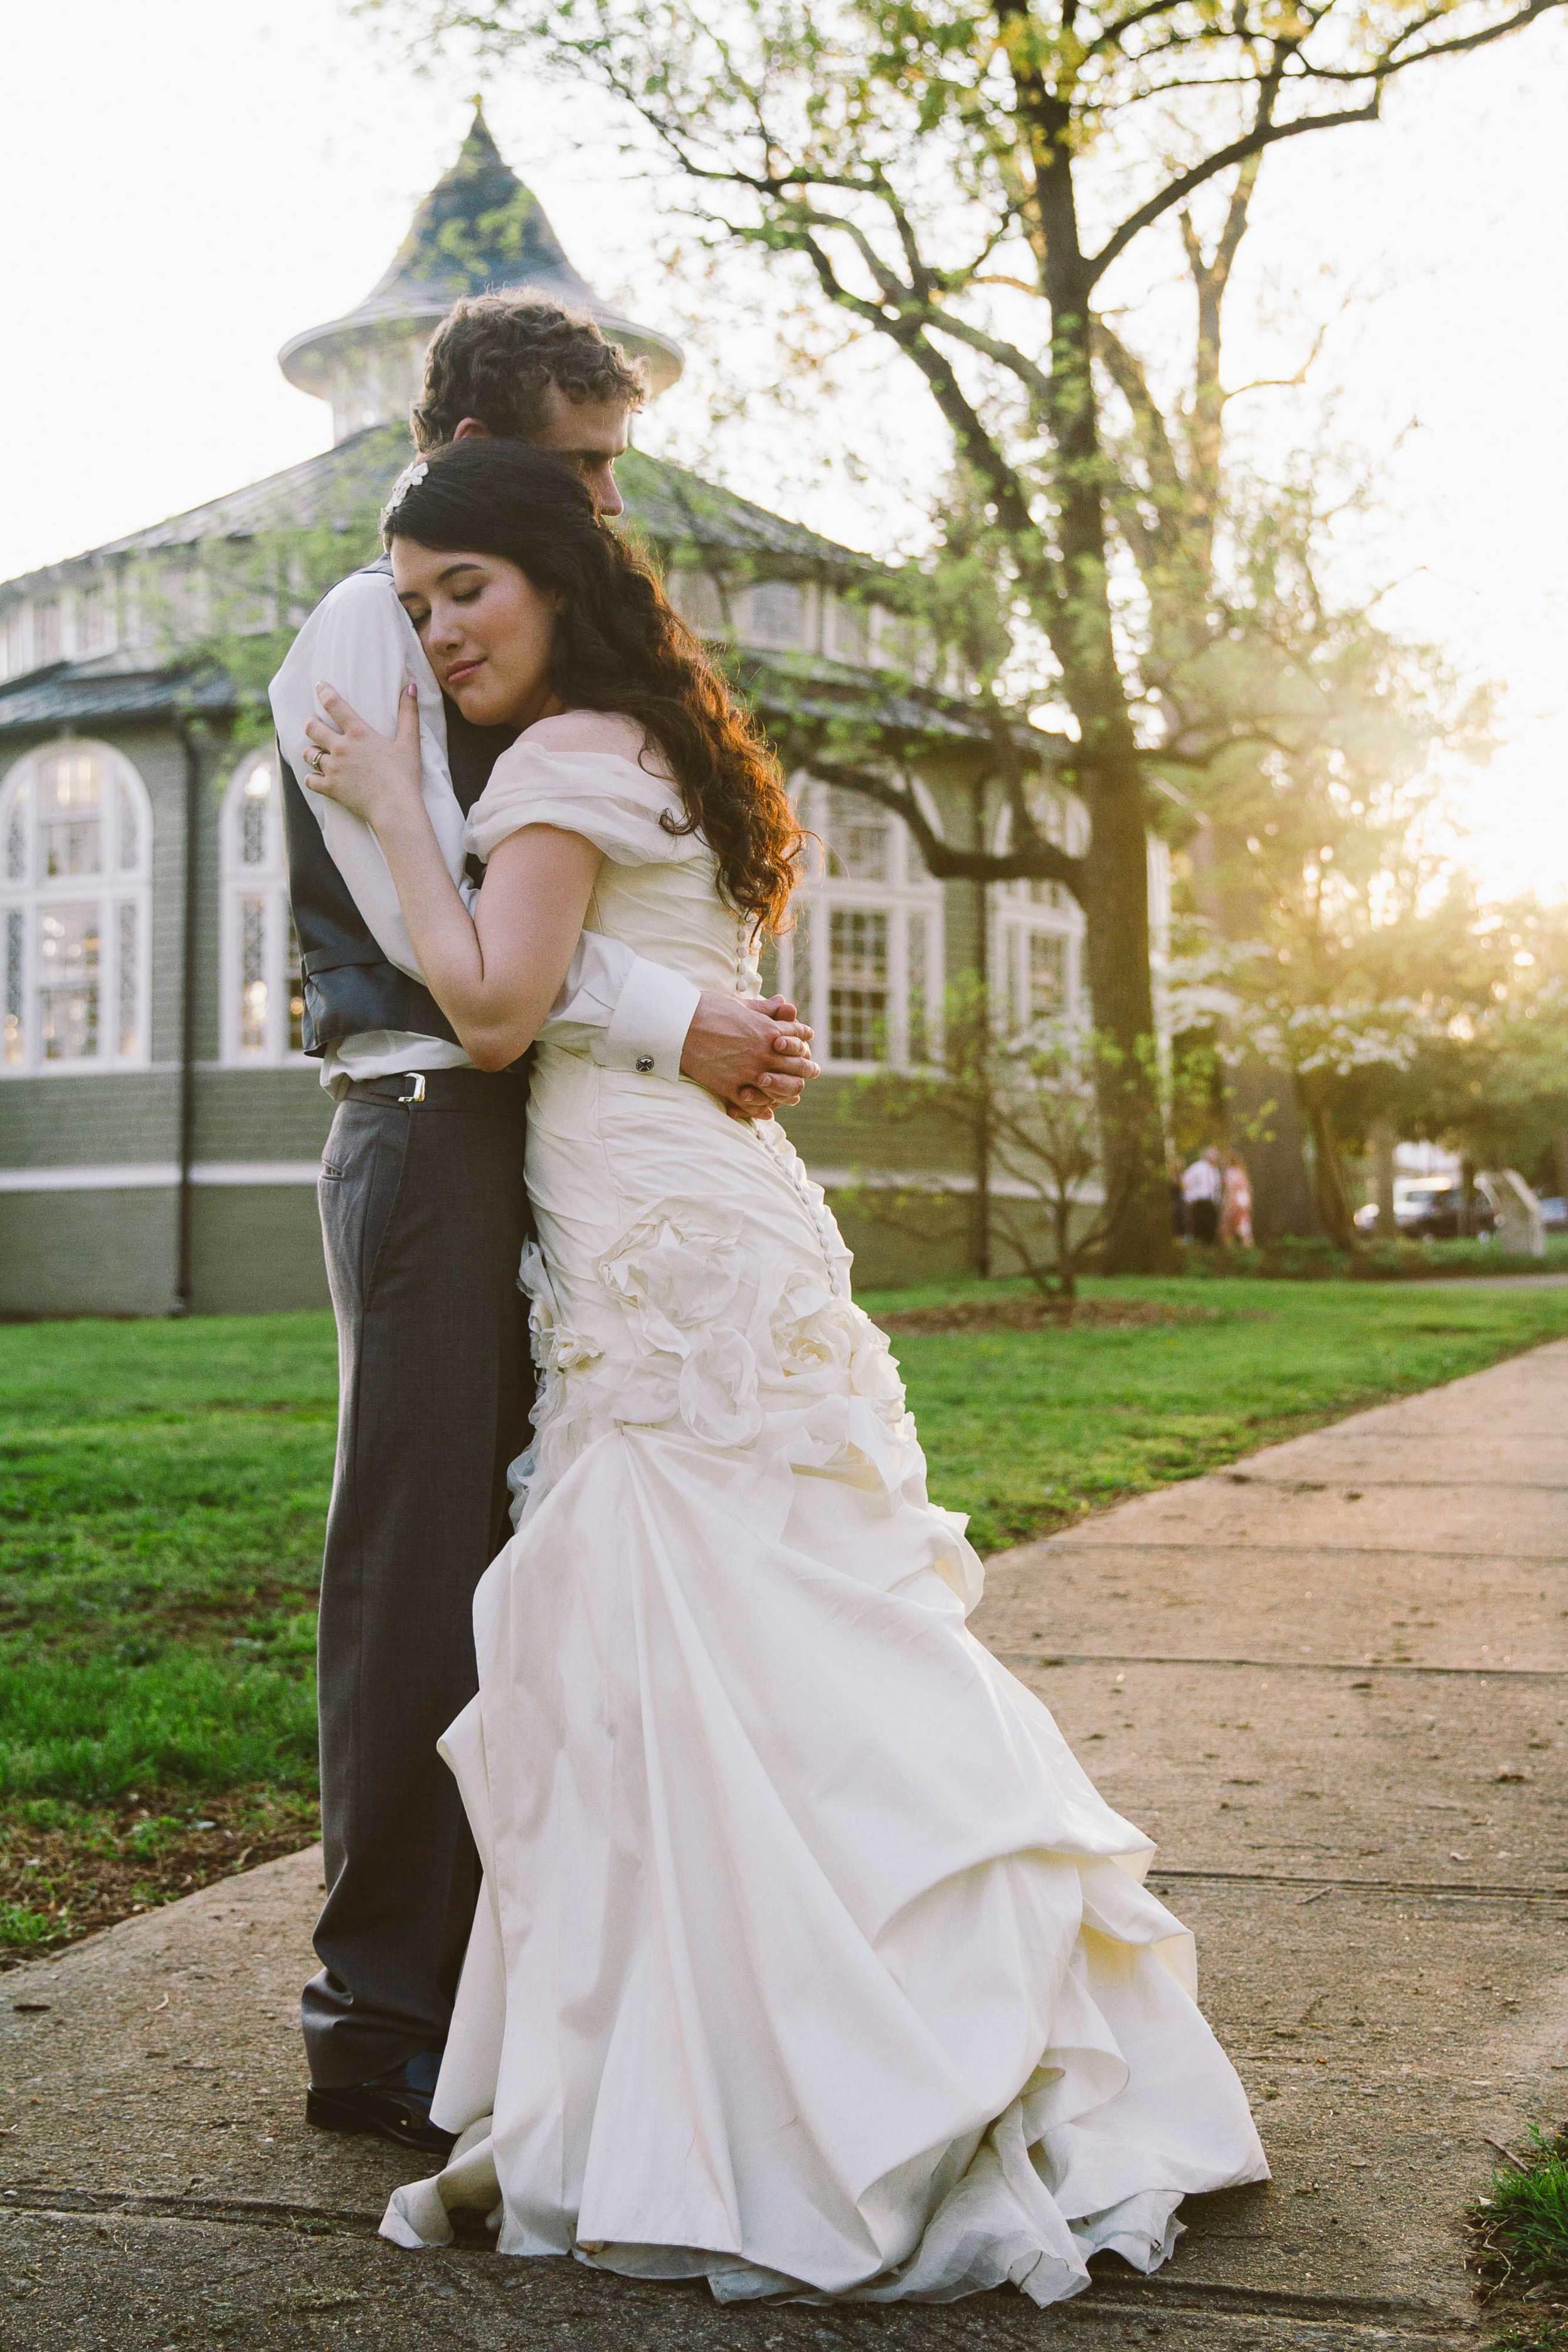 Radka-Wedding-Radka-April-18-2015-0553.jpg